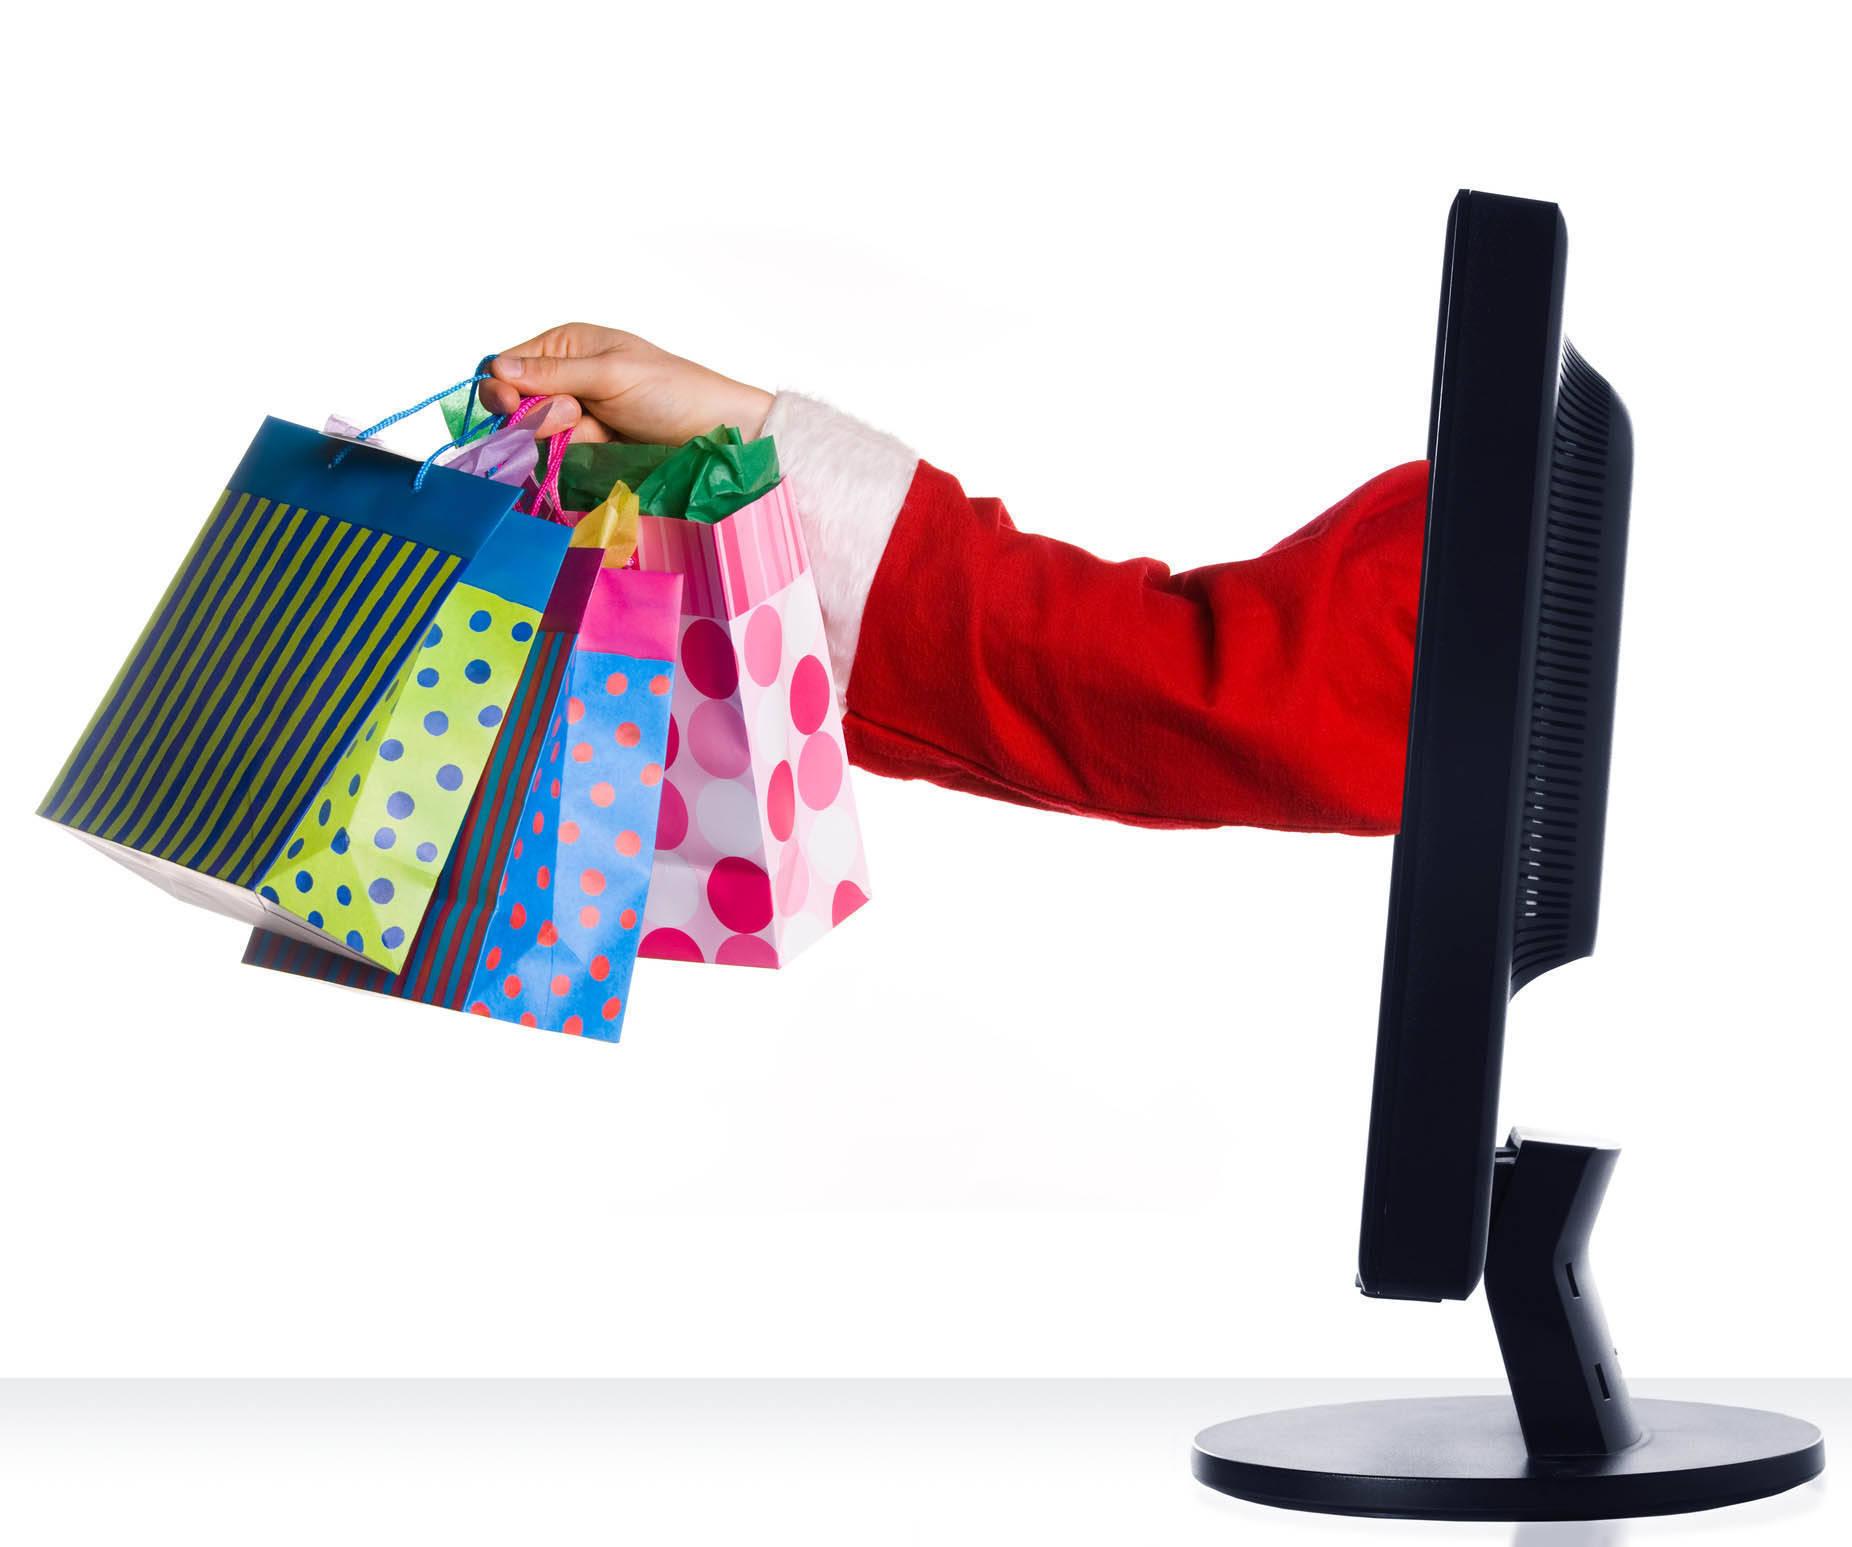 3e91caa7eb04a6c716f9_b0094ea736e4963c341e_holiday-shopping.jpg